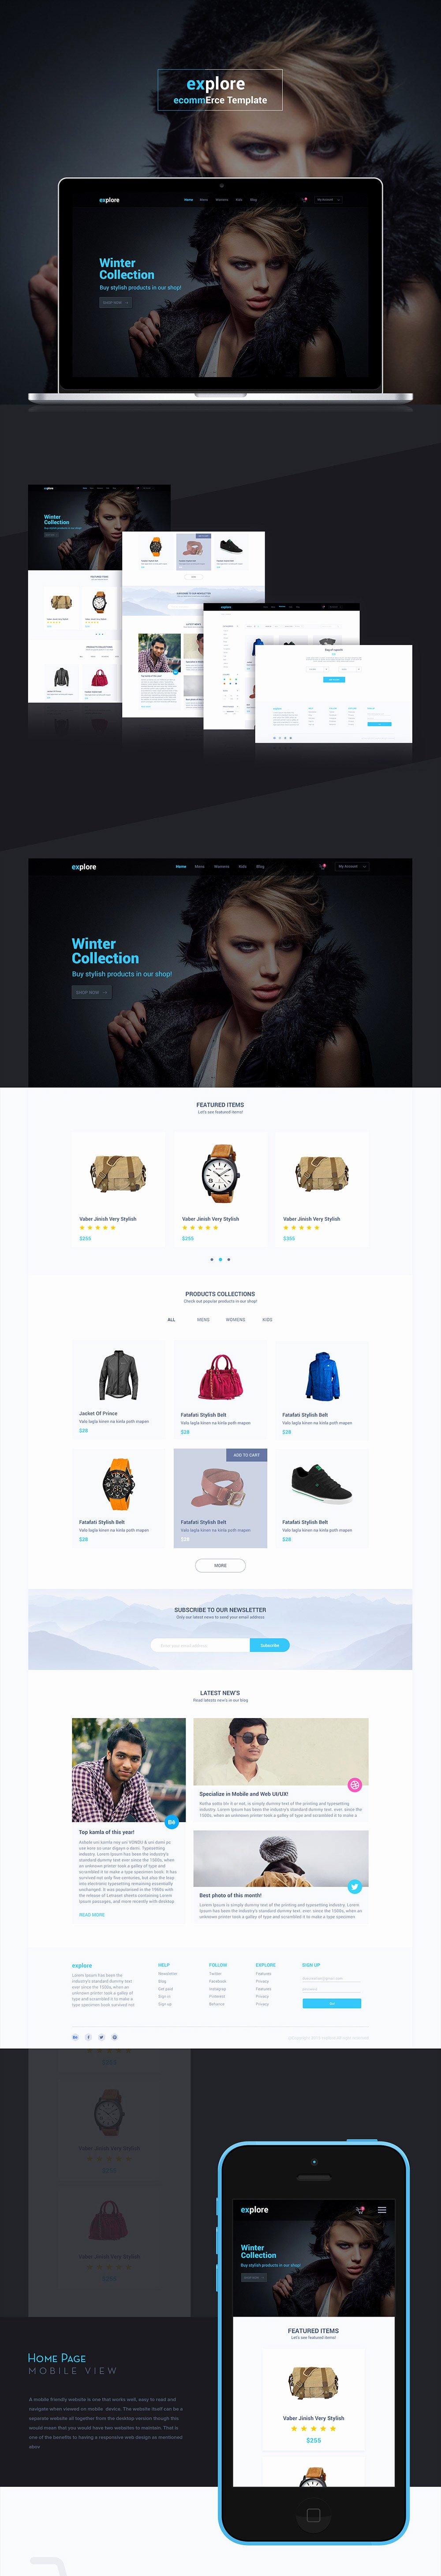 Simple E Merce Website Templates Free Psd Set Download